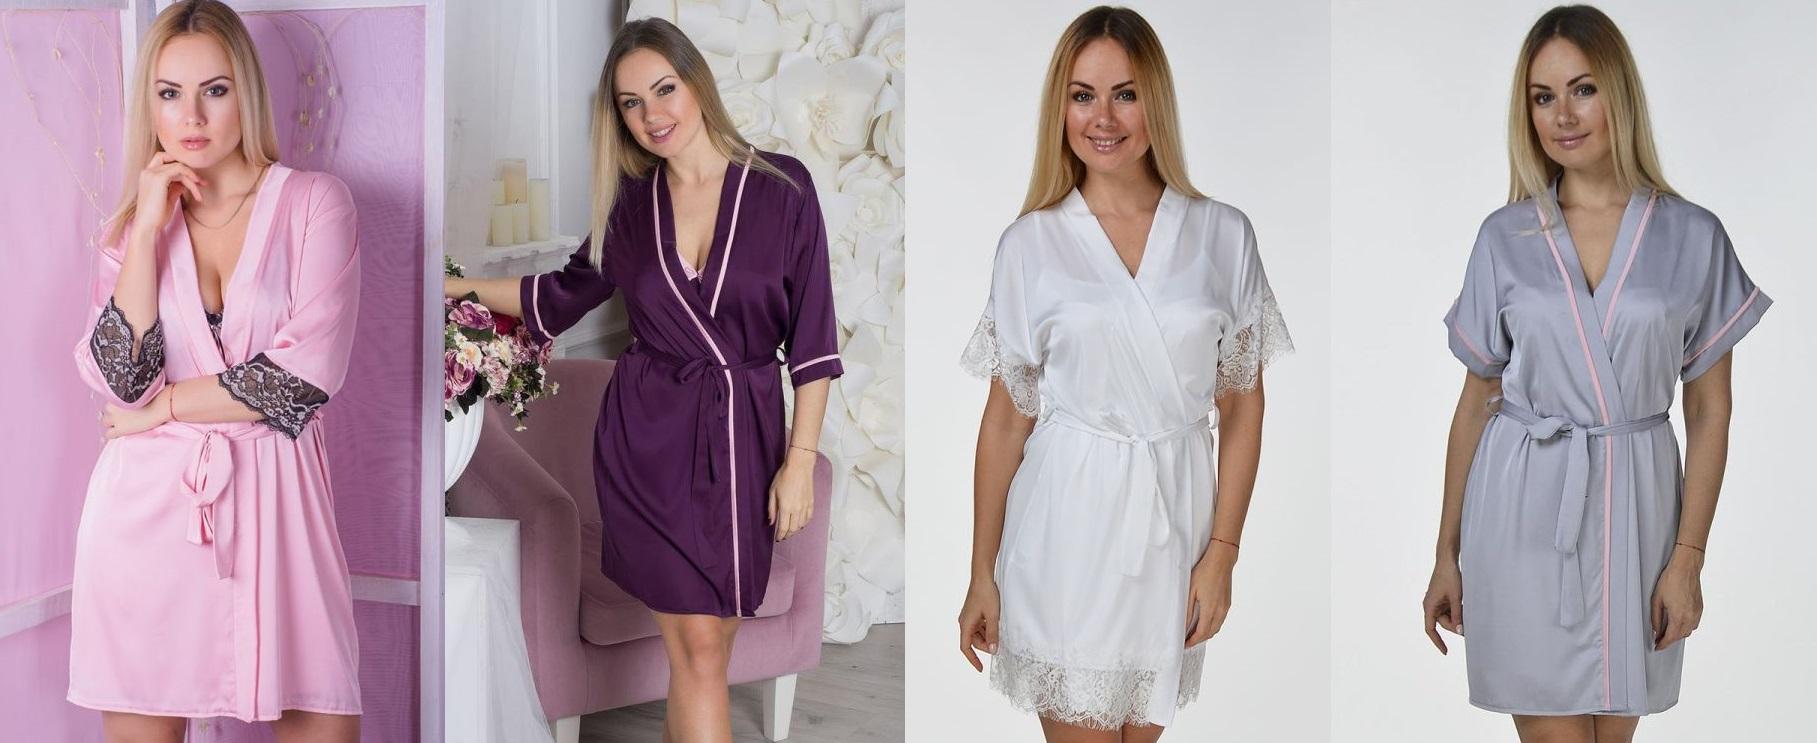 MiaNaGreen халаты шелк купить